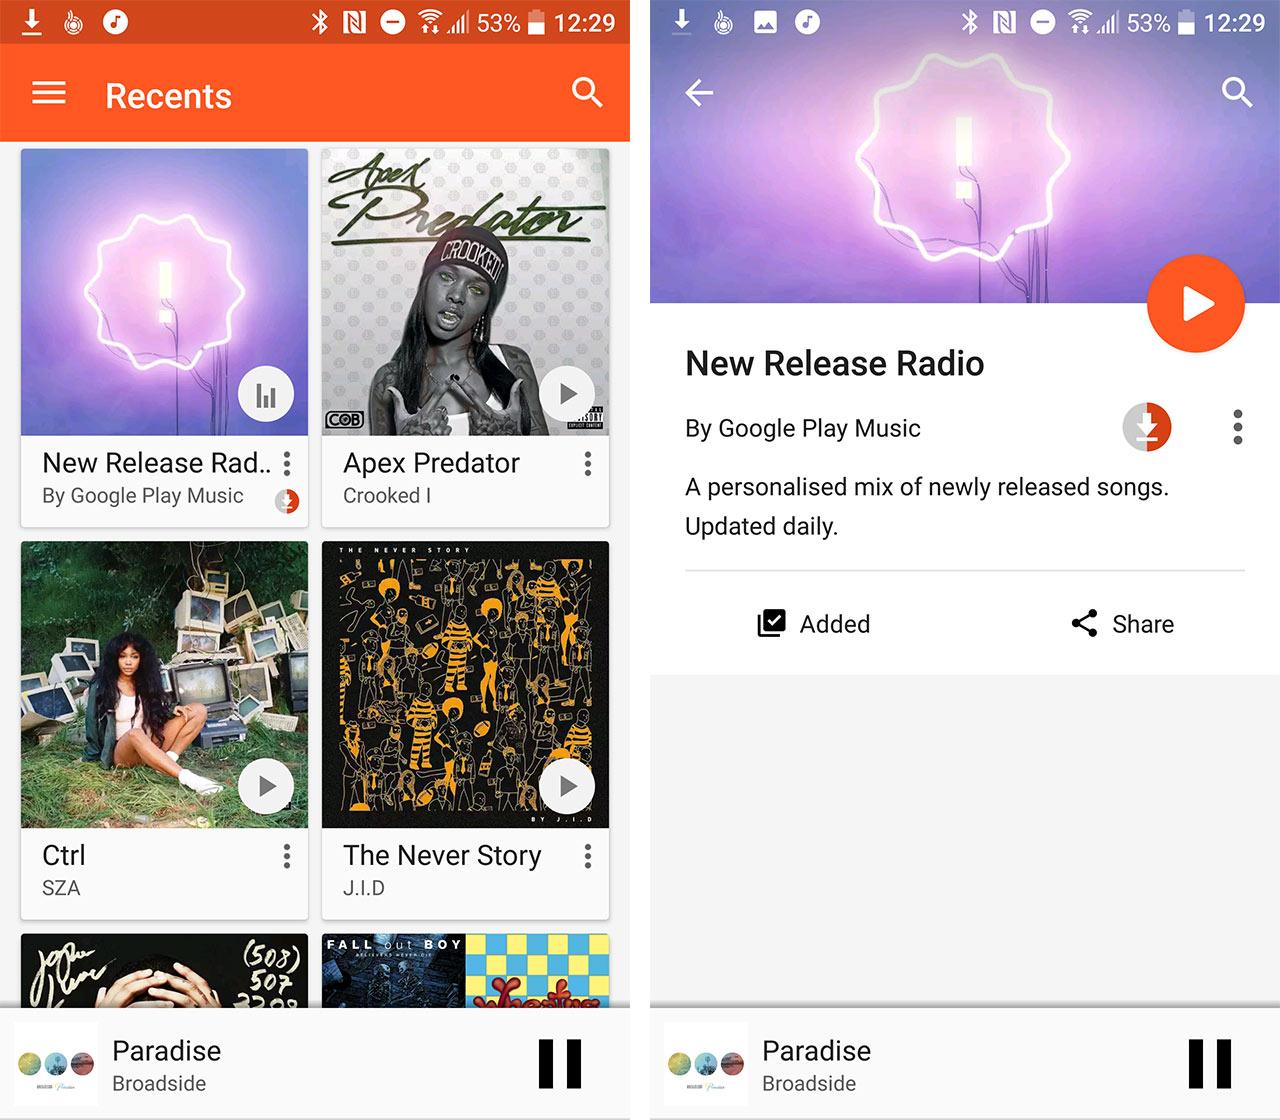 New Release Radio playlist on Google Play Music